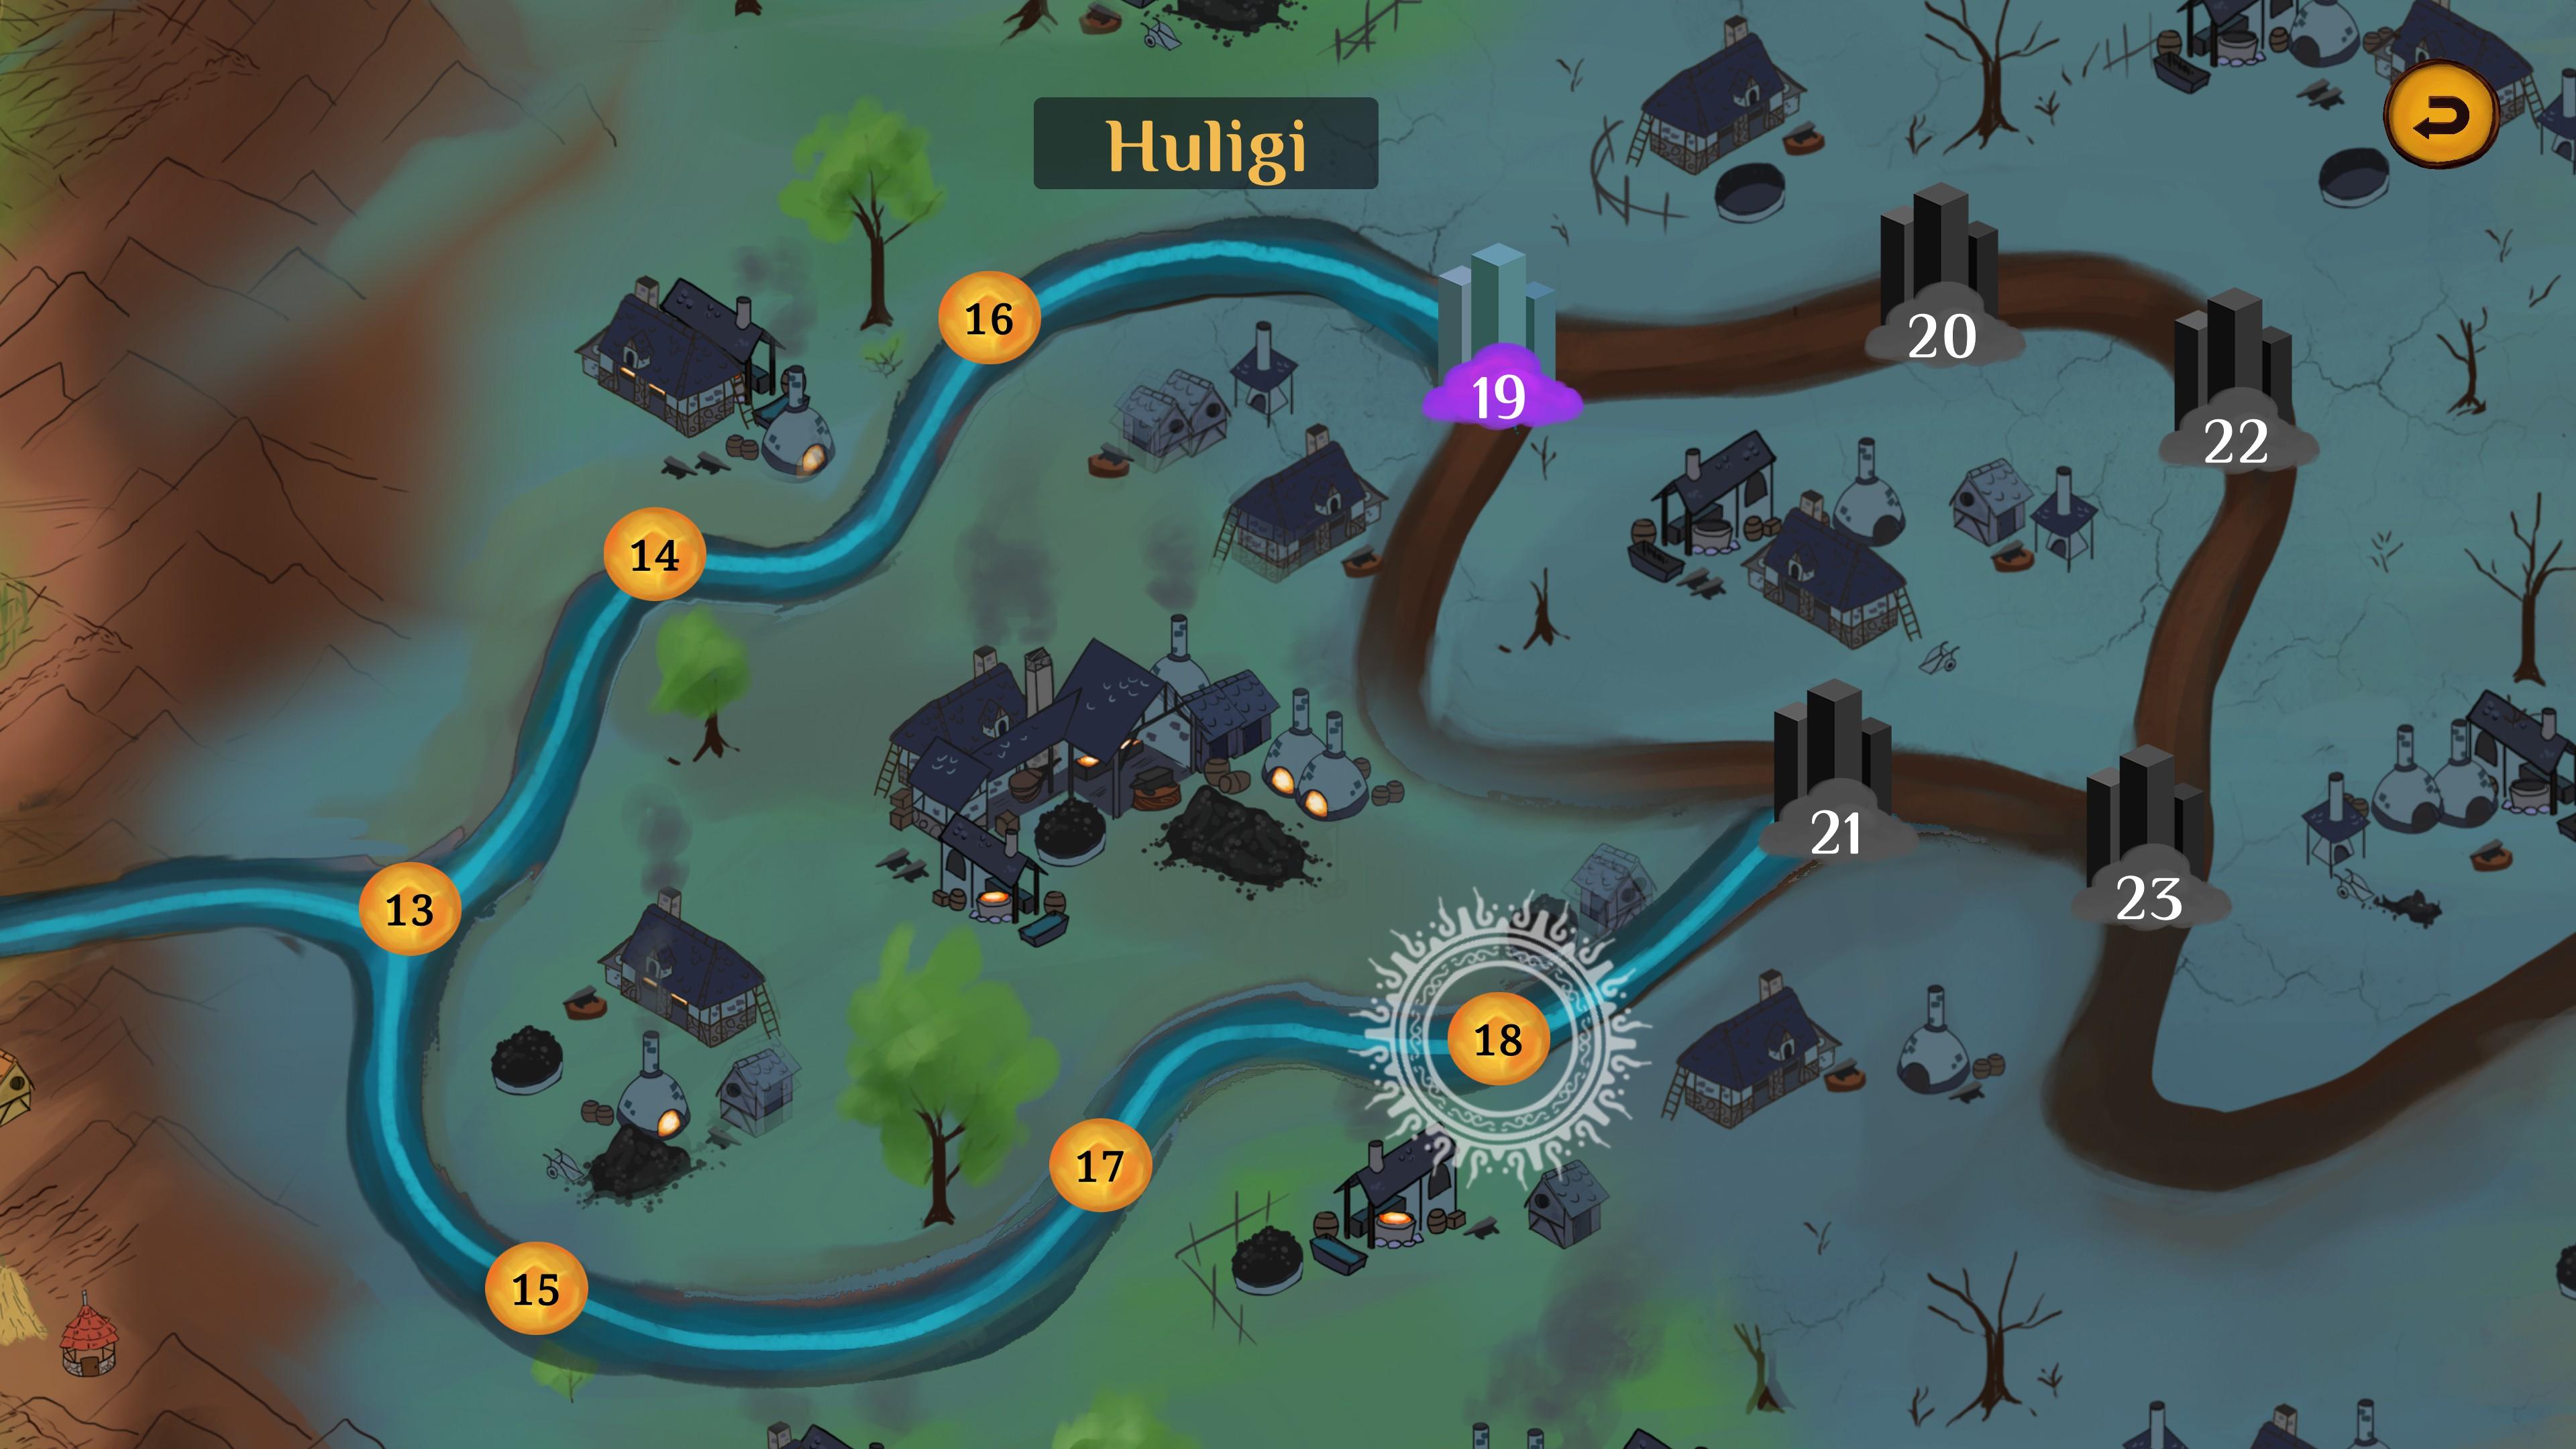 Mystic Pillars. Overworld view of the village of Huligi